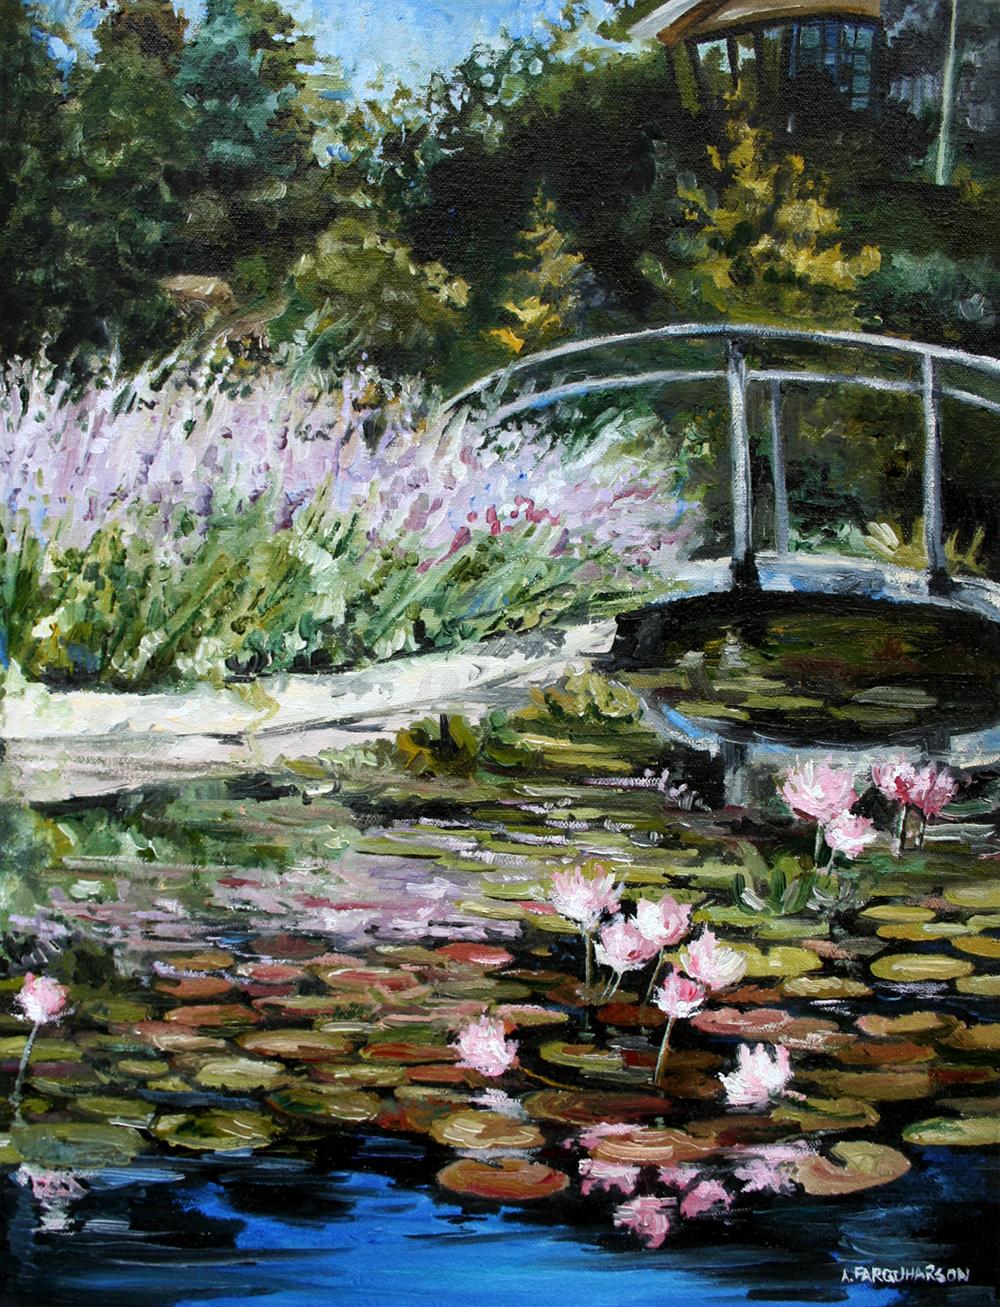 Russian sage waterlilies and foot bridge by Amanda Farquharson 2019.jpg